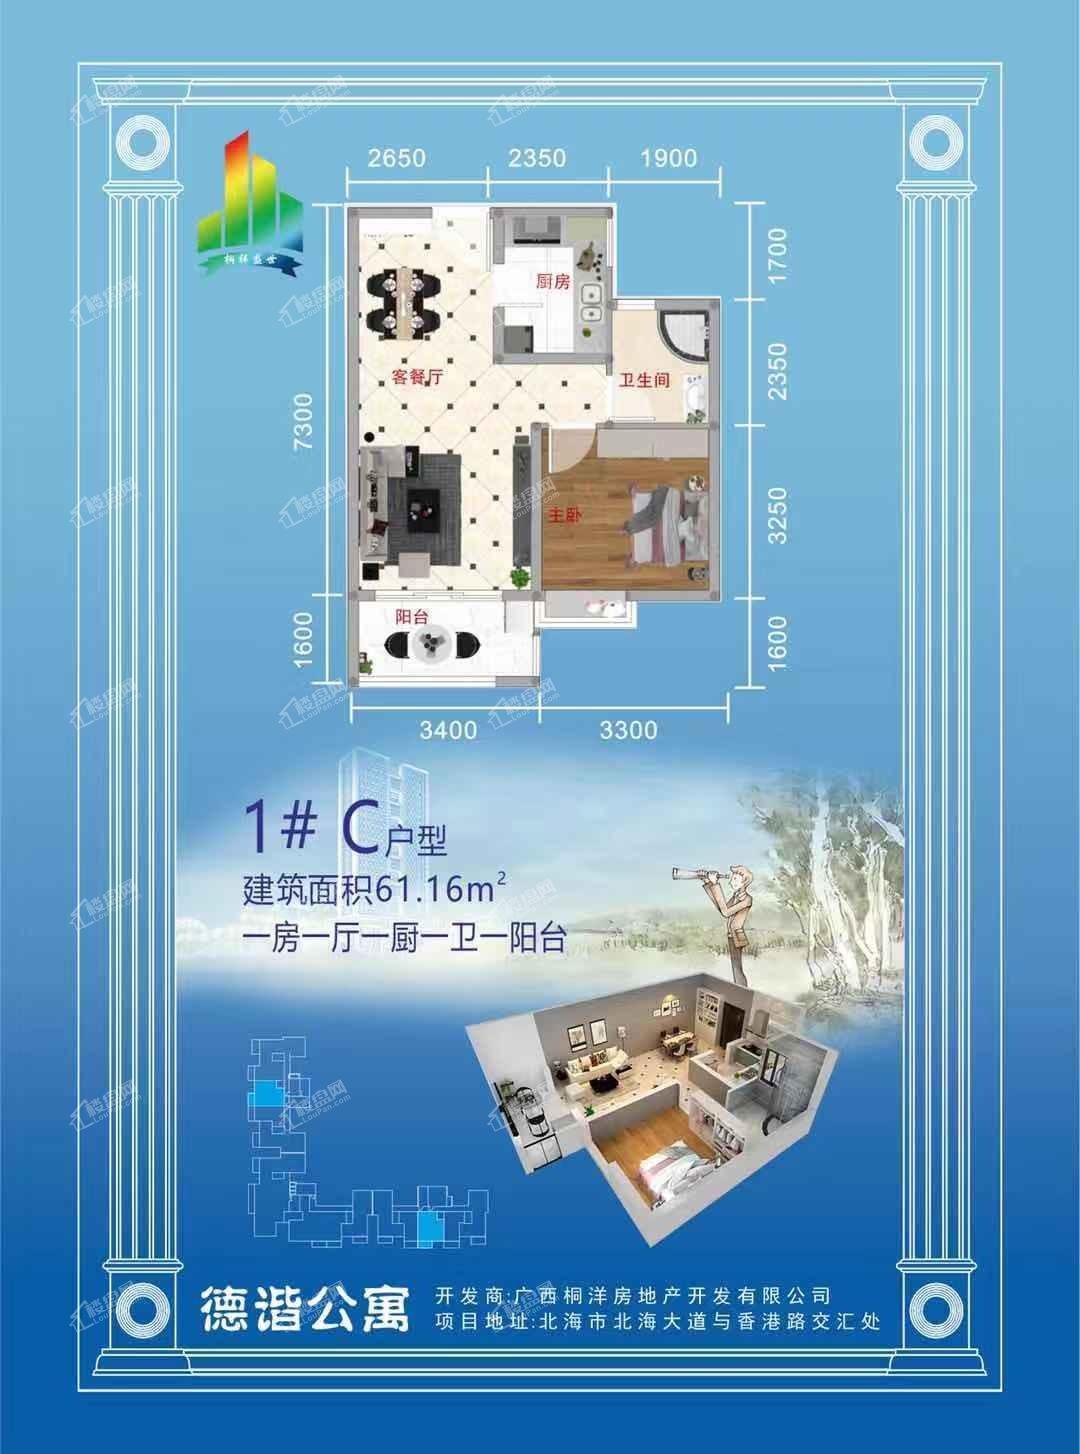 德谐公寓1#C户型61.16㎡